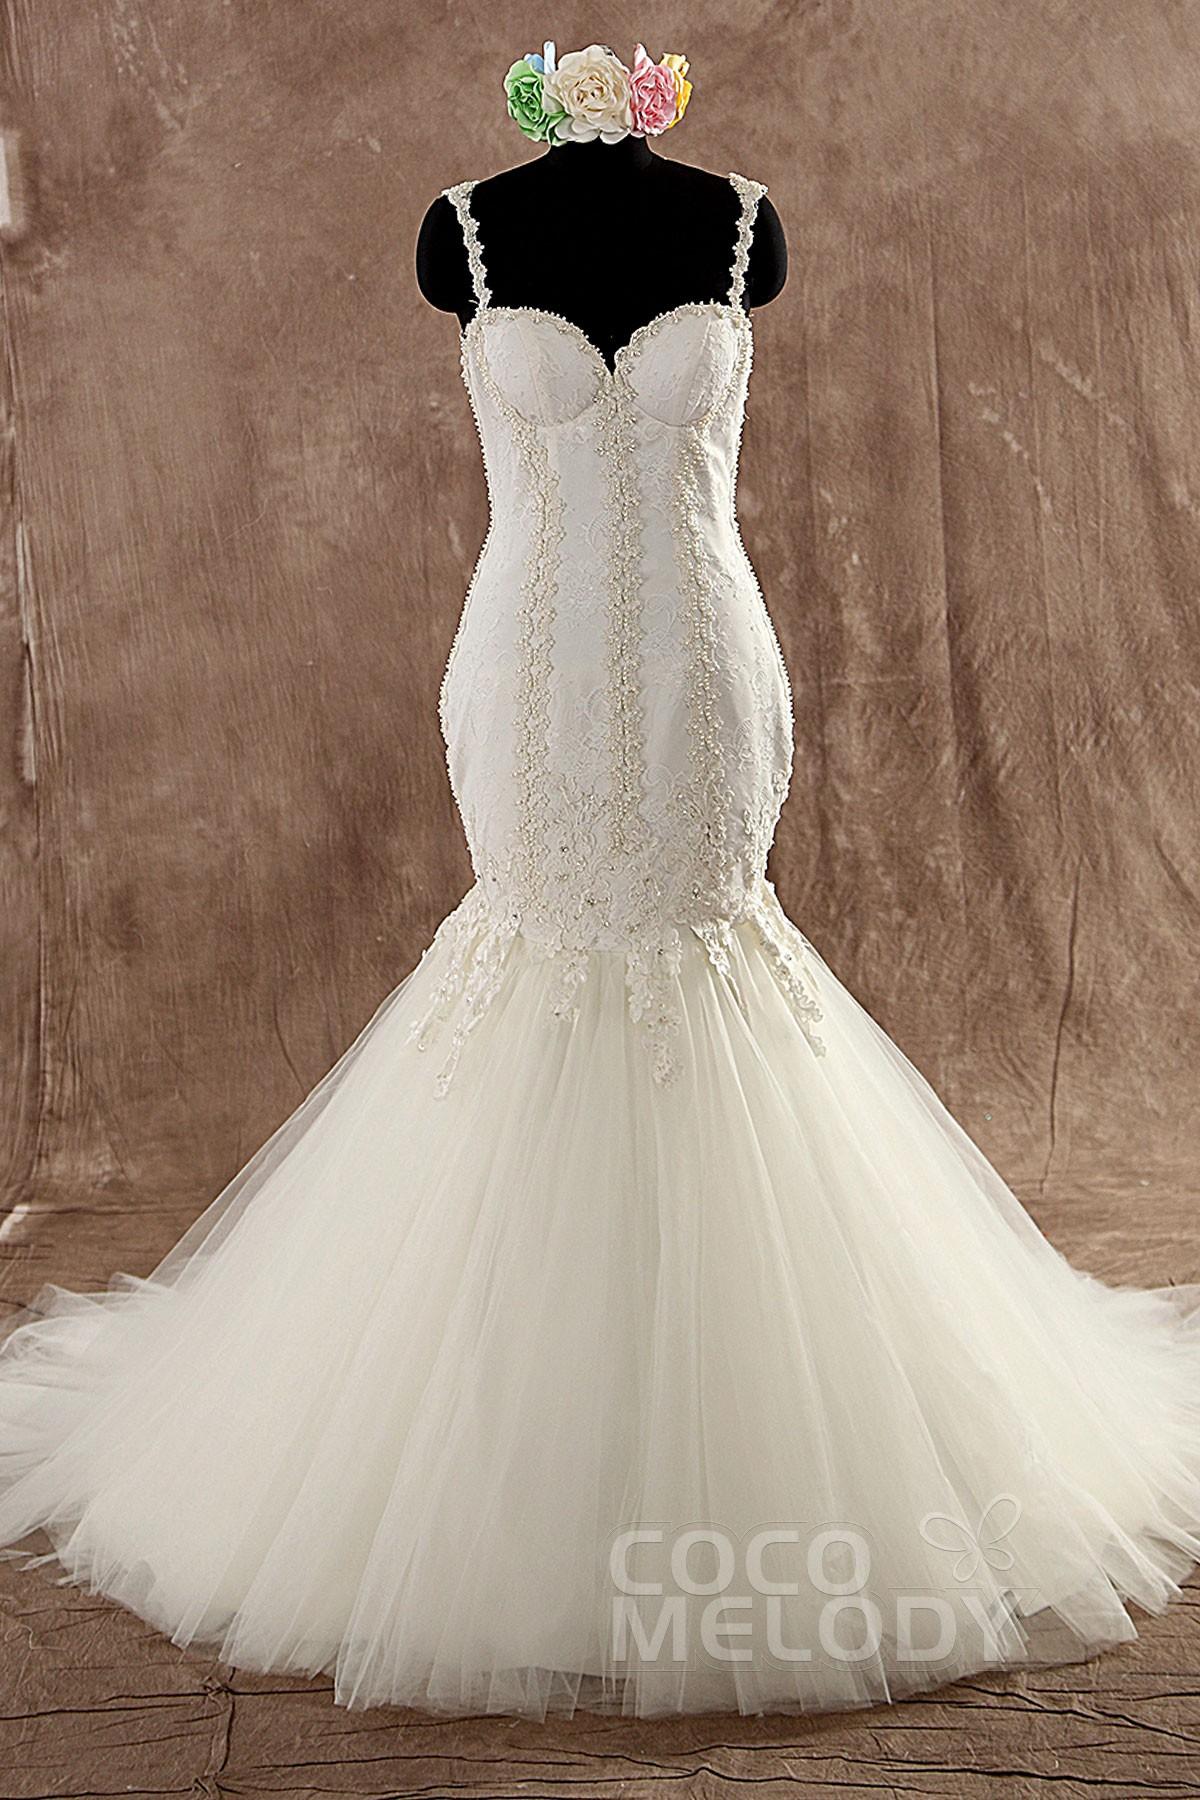 Chic Trumpet-Mermaid Spaghetti Strap Train Tulle Ivory Sleeveless Wedding Dress with Appliques LWVT1402B